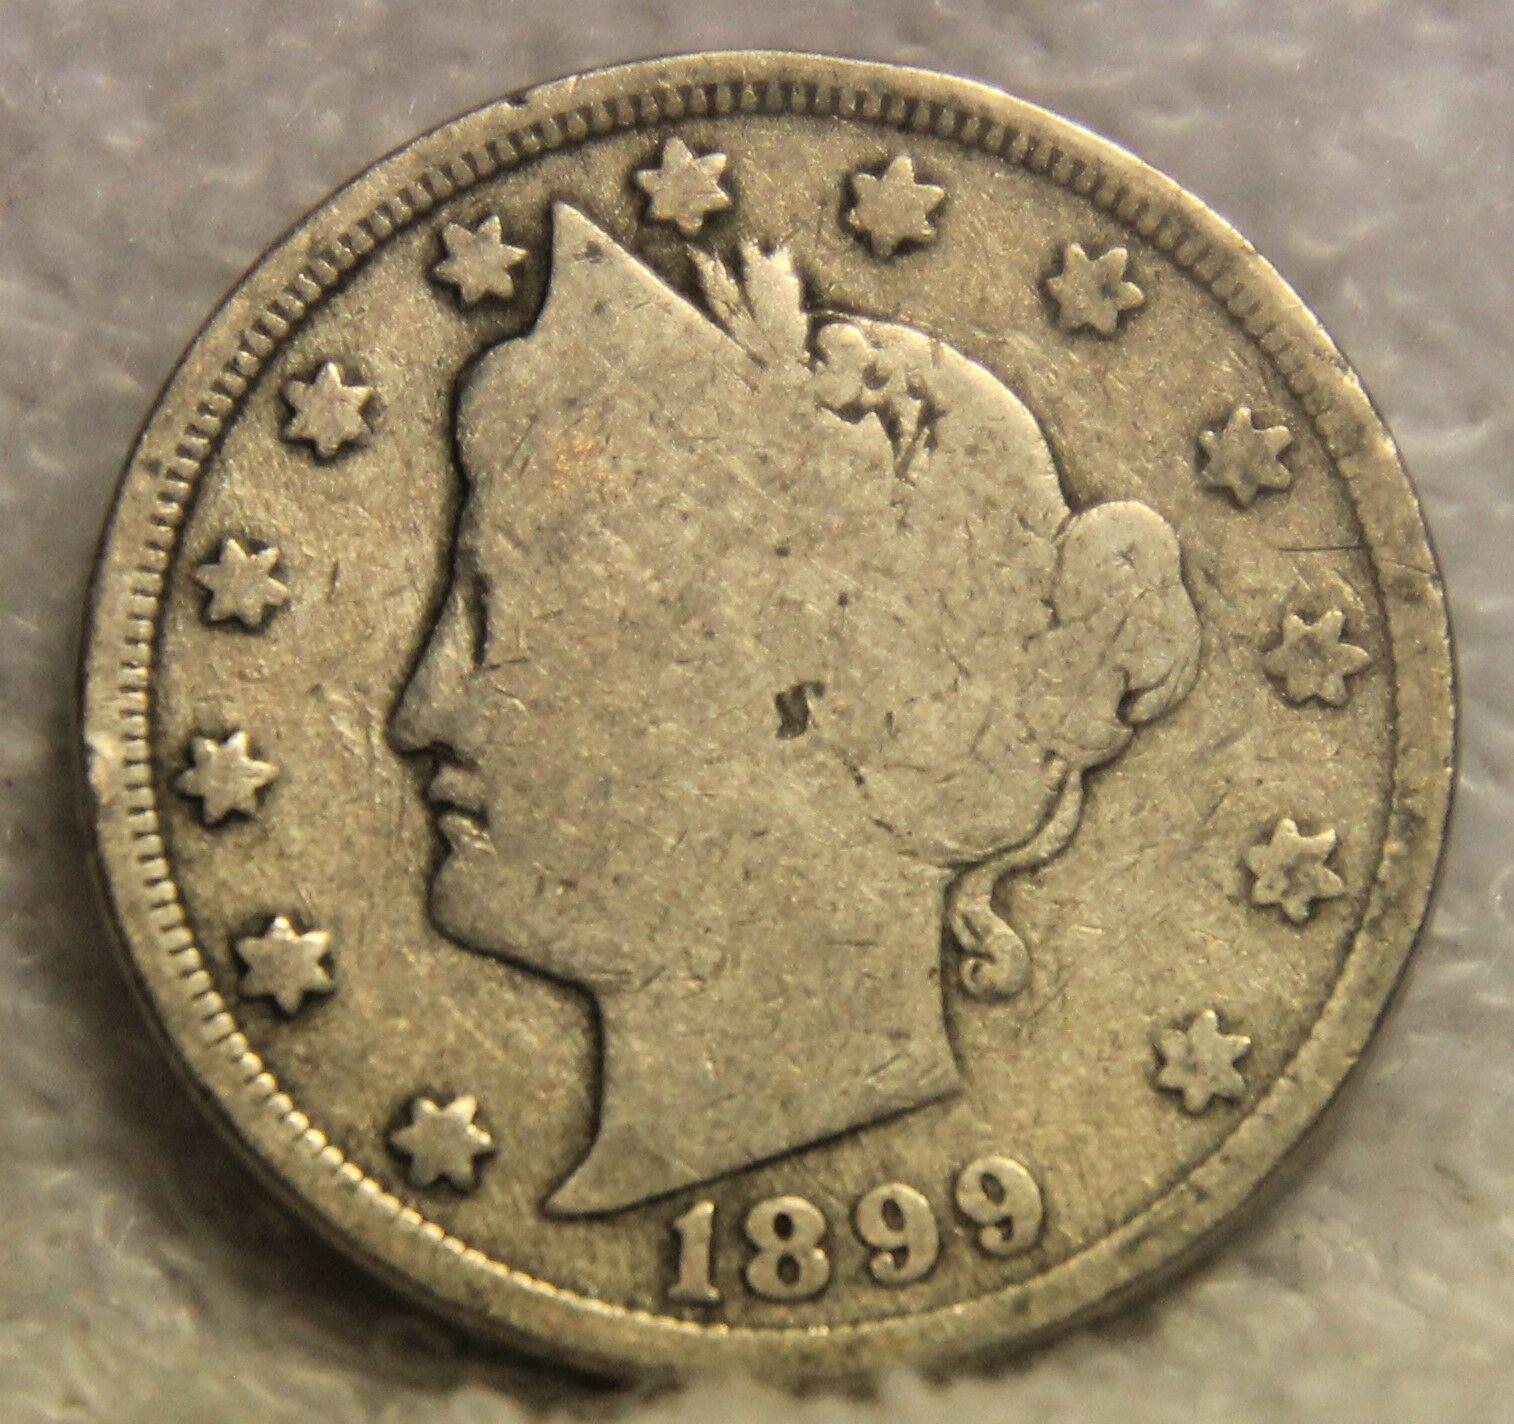 1899 Liberty Nickel - $3.95